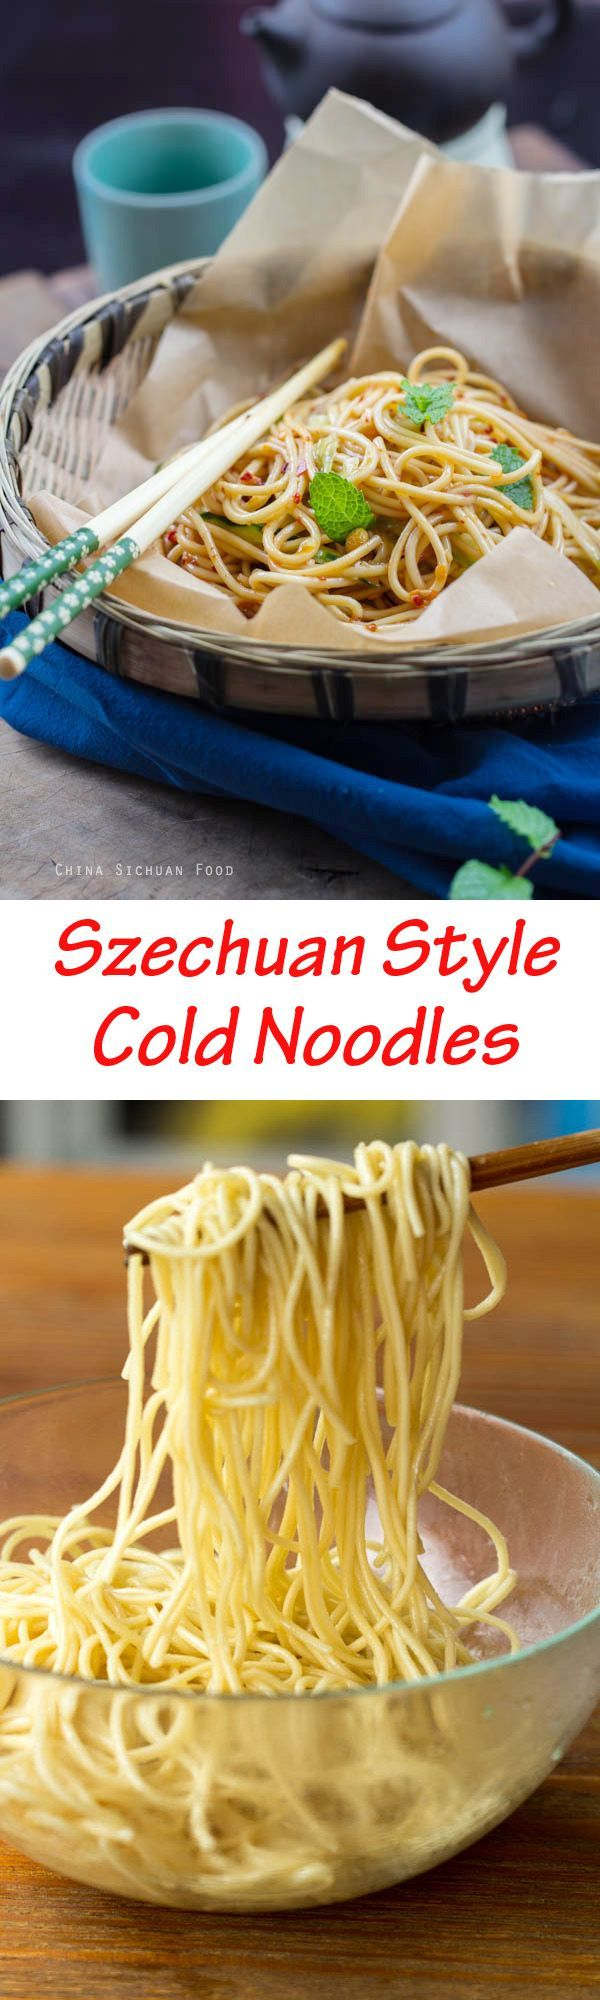 Szechuan Cold Noodles | China Sichuan Food